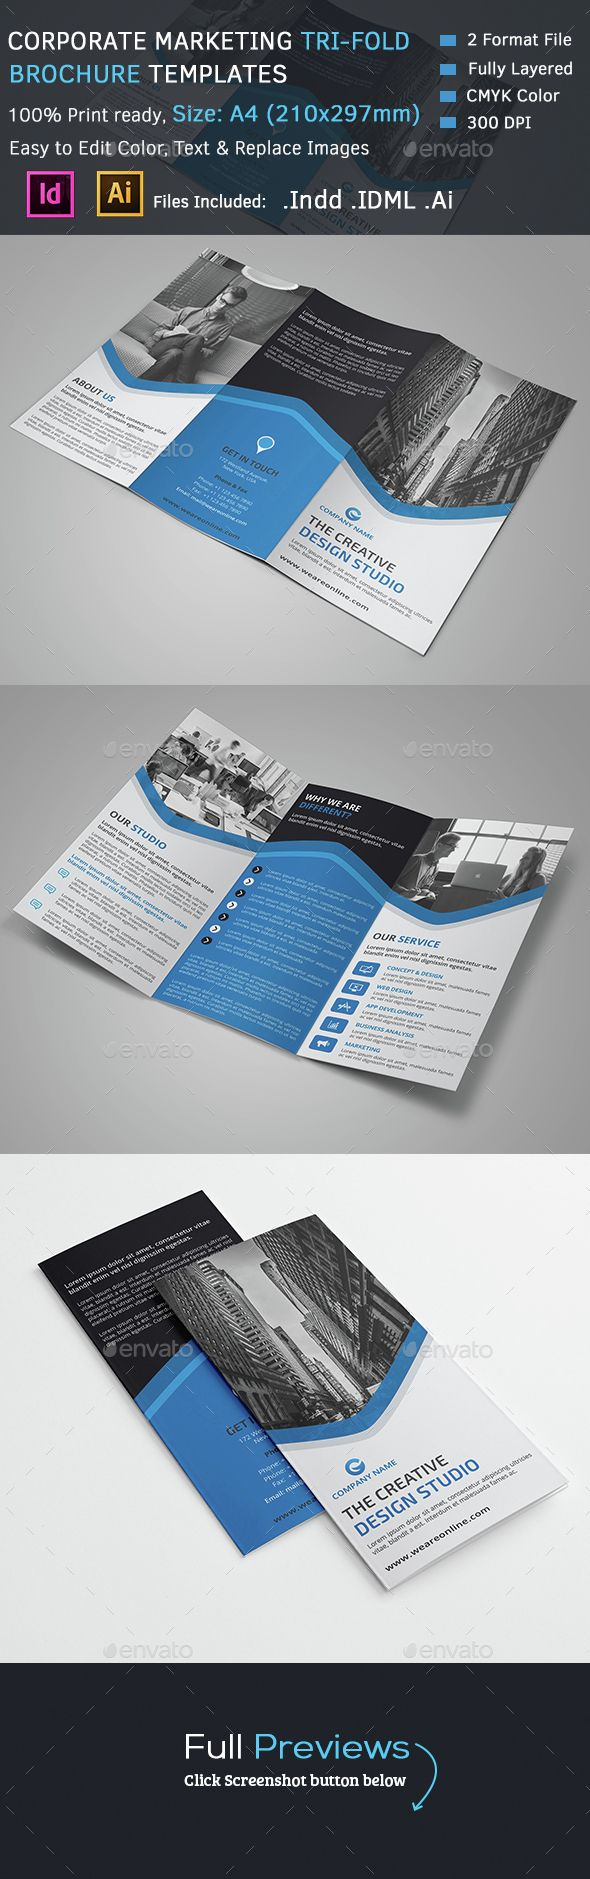 tri fold brochure template indesign